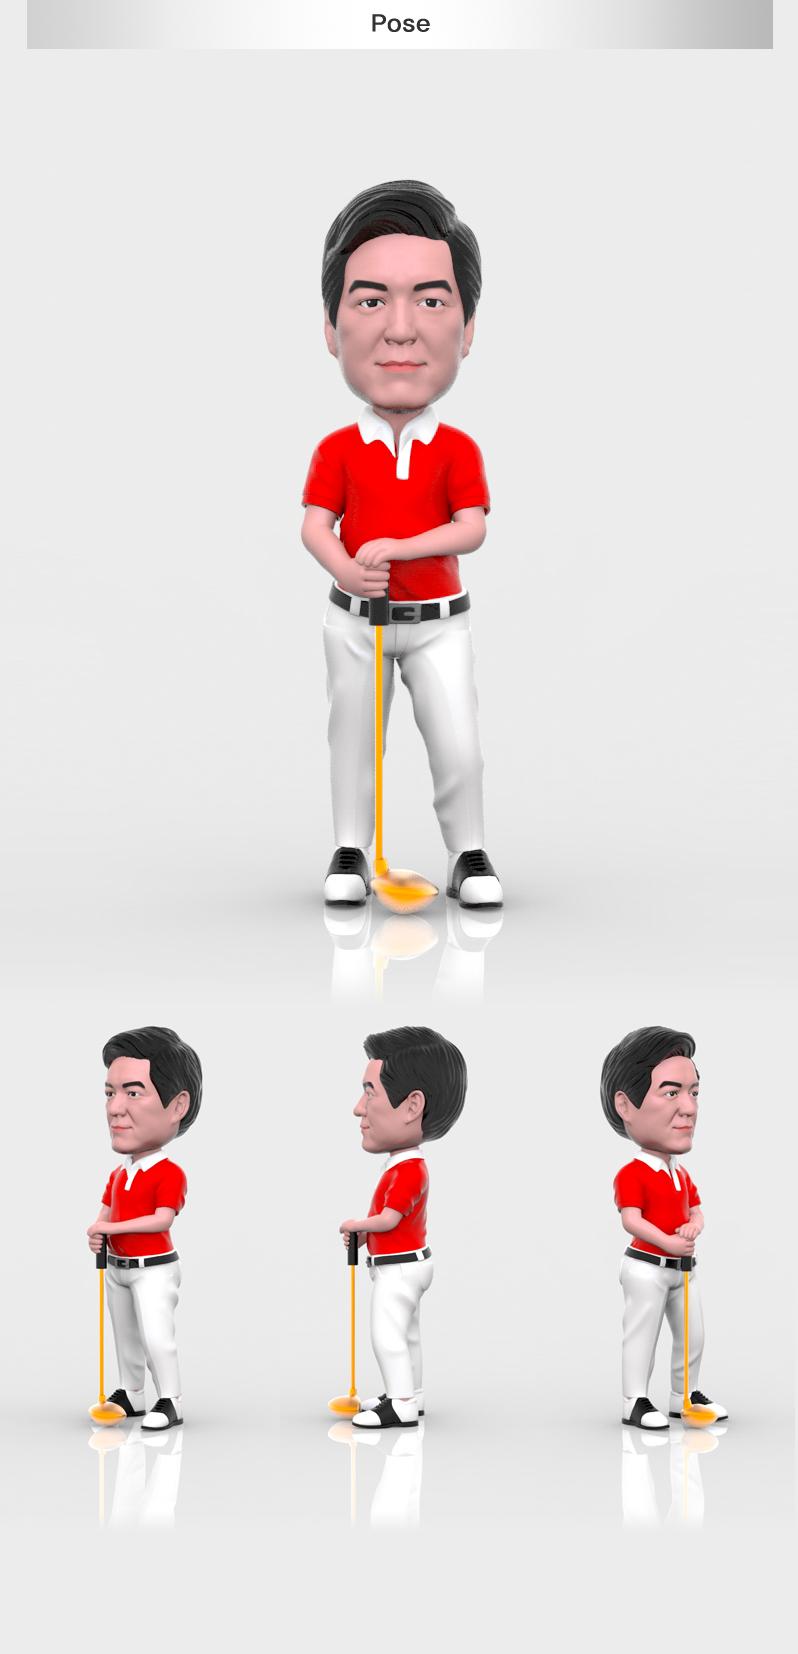 golf_m_pose01